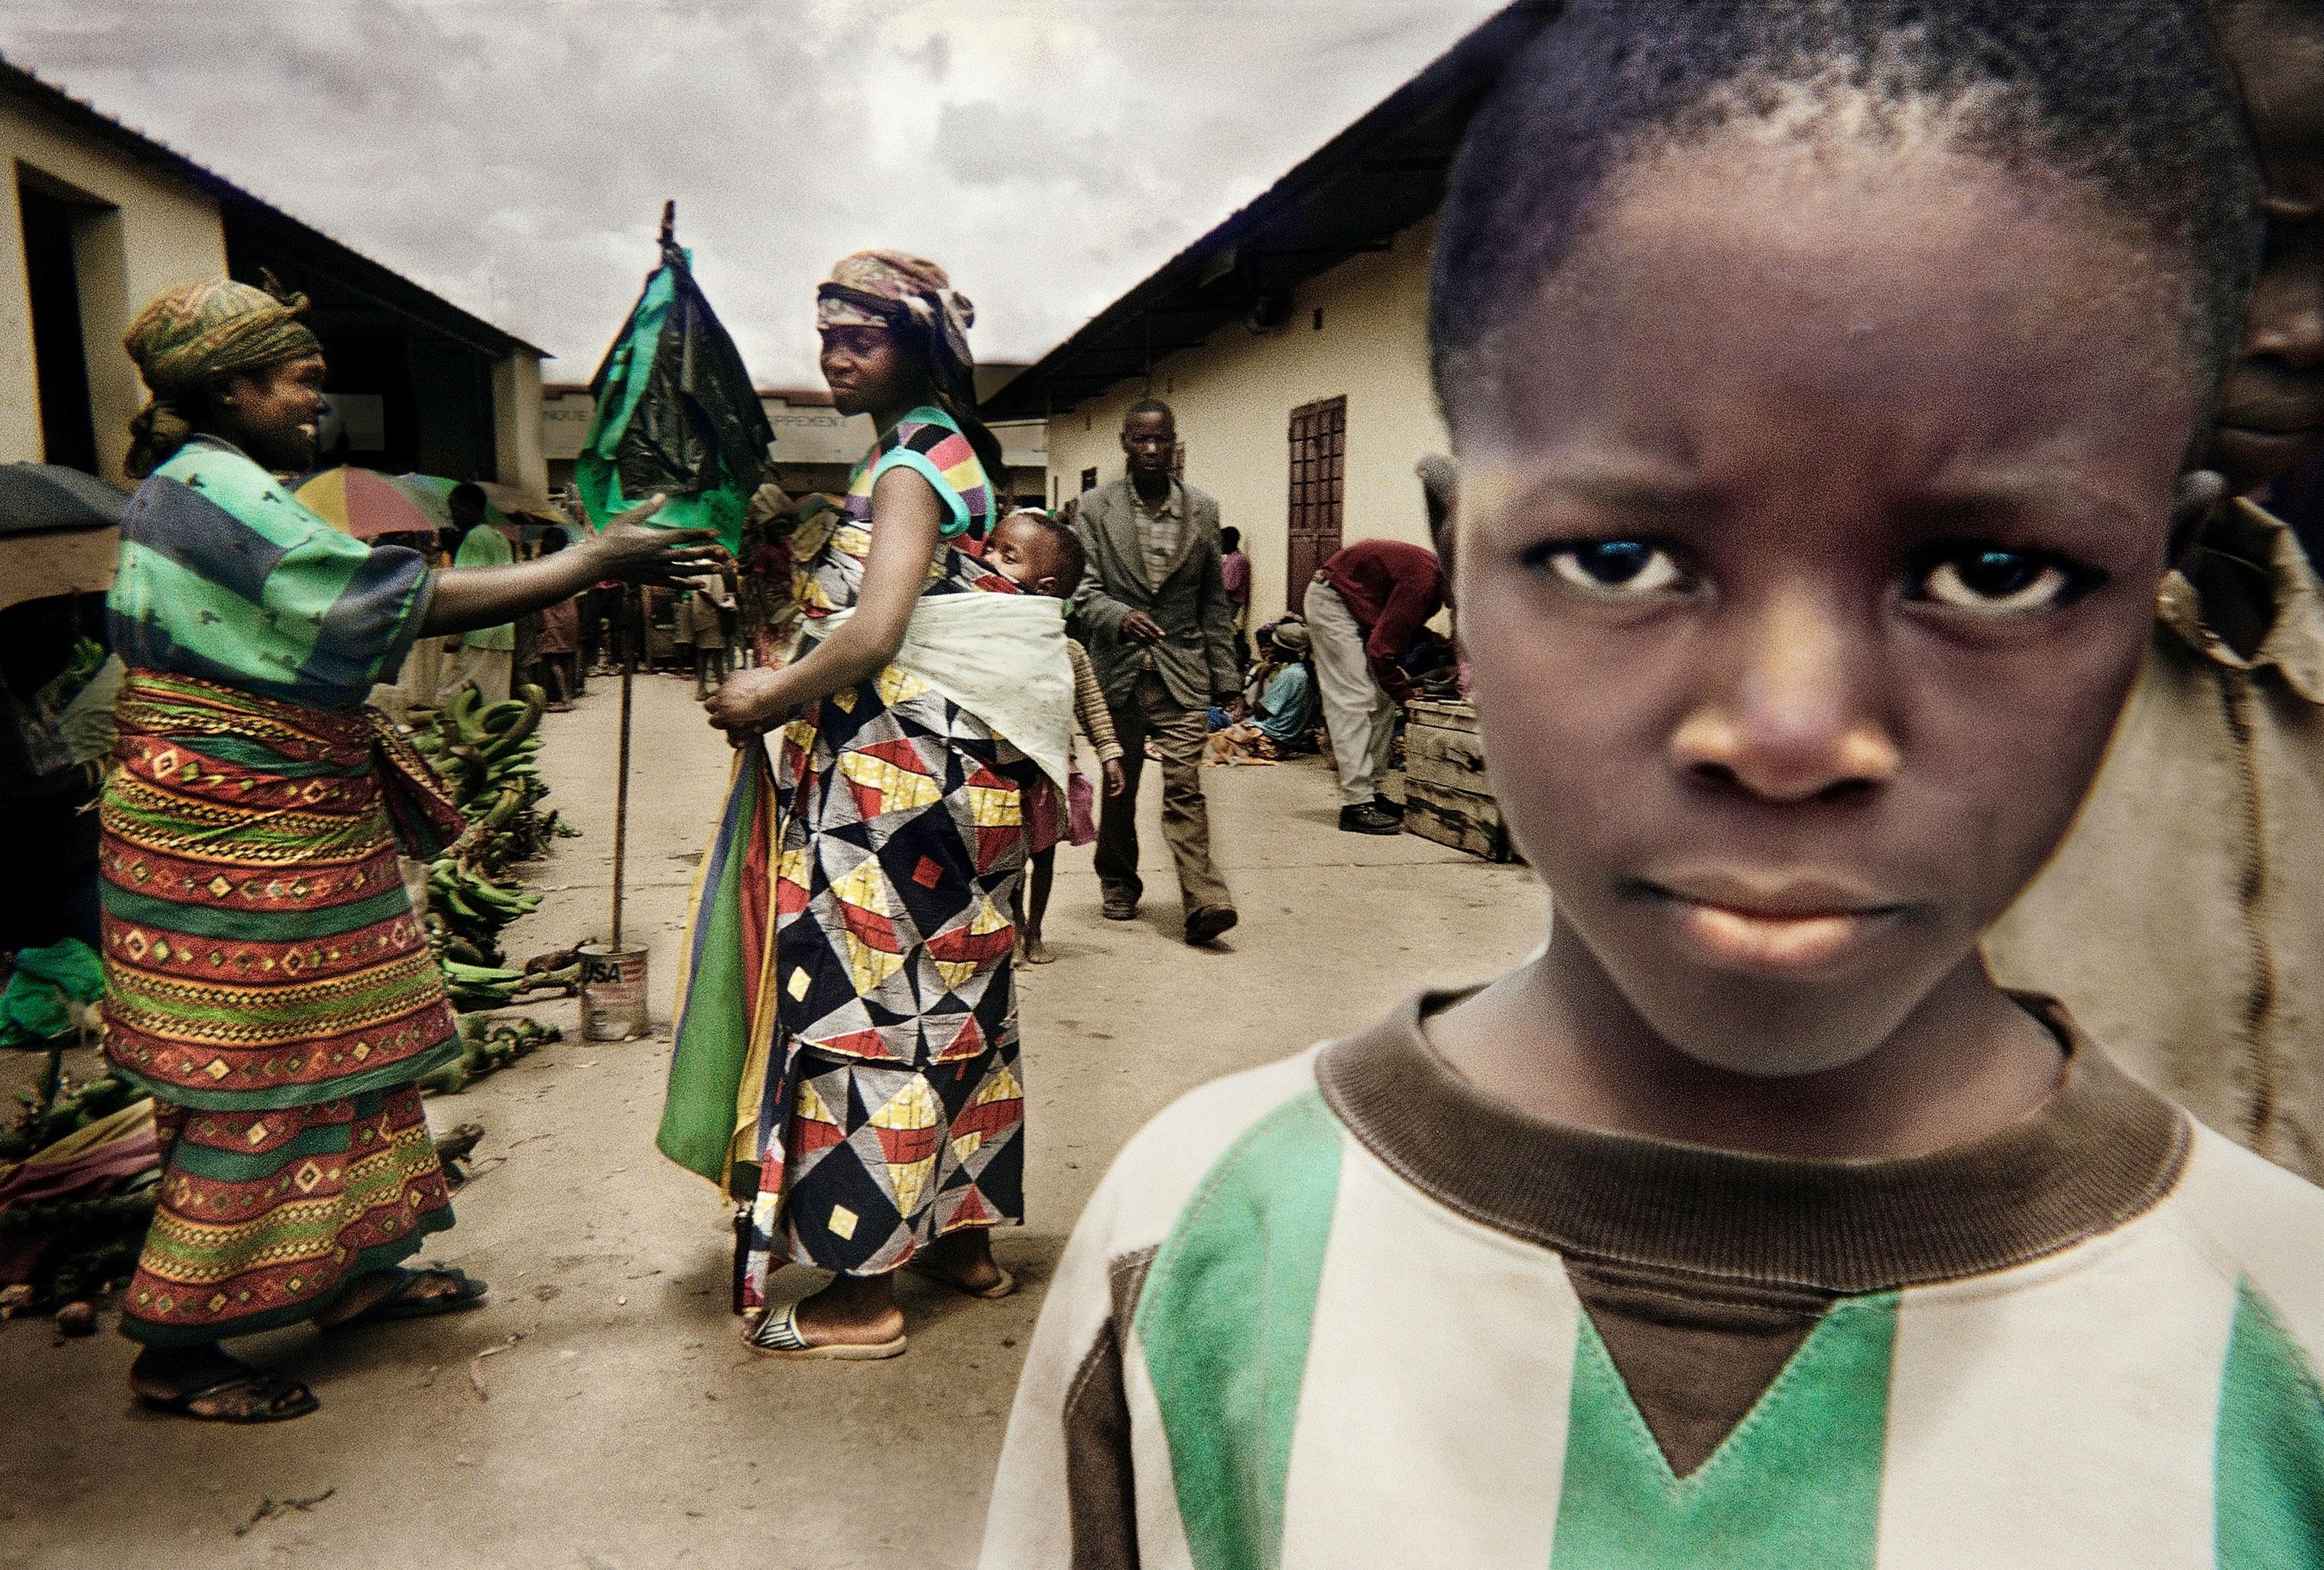 Portrait of Gadi Habumugisha taken at the market, made by one of the  camera kids , Jacqueline Niyonkuru, when she was 8 years old.